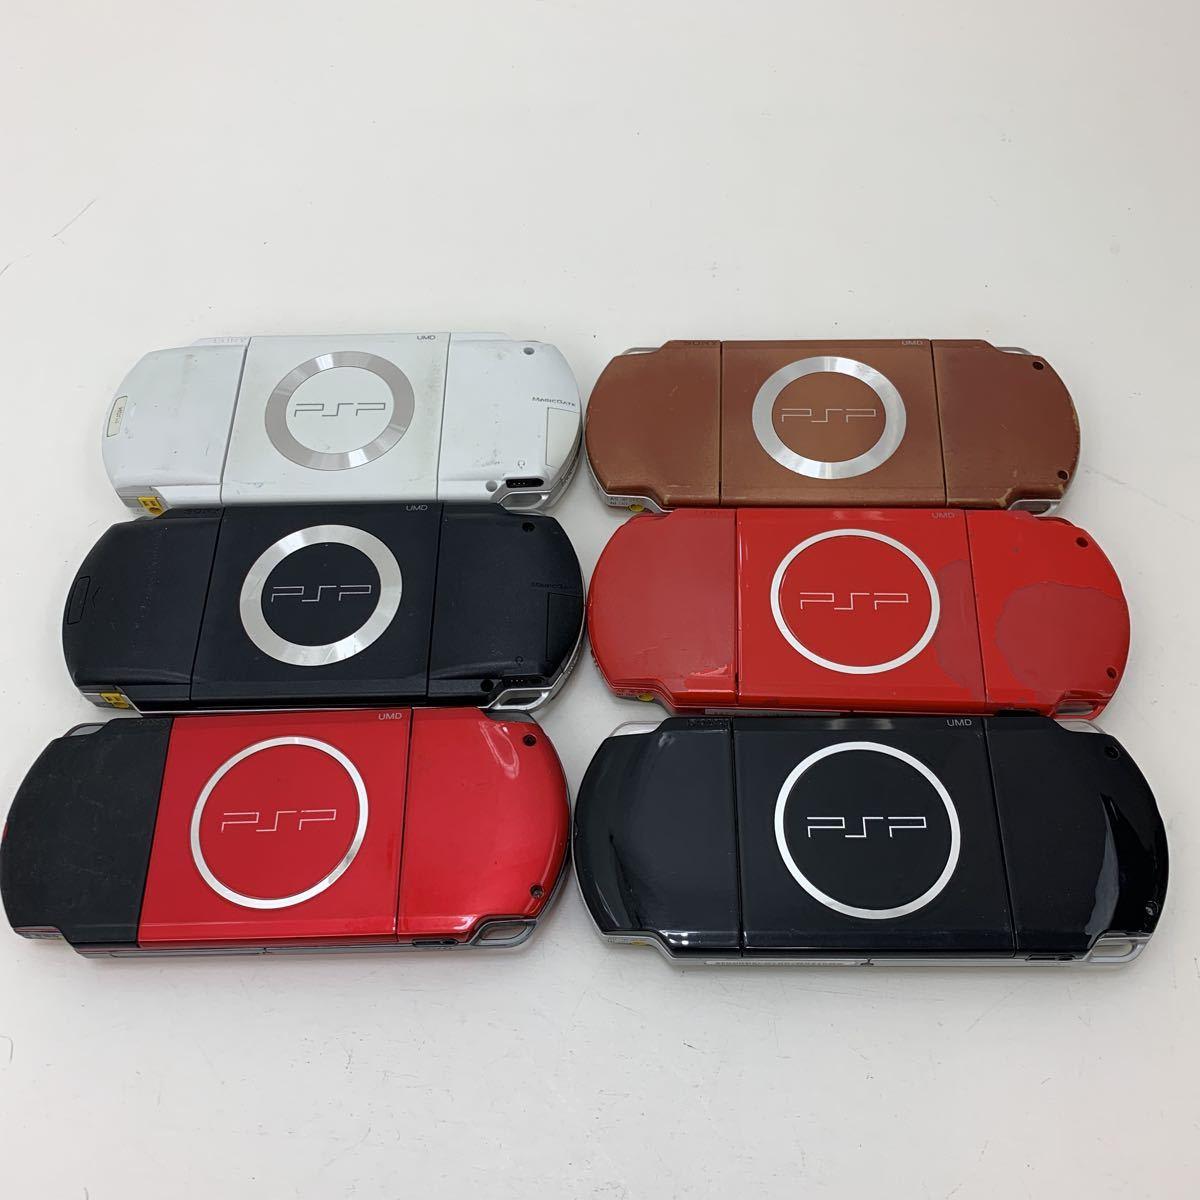 ソニー SONY 現状品 / PSP-3000 3台 / PSP-2000 1台 / PSP-1000 2台 / 計6台セット 現状品_画像3